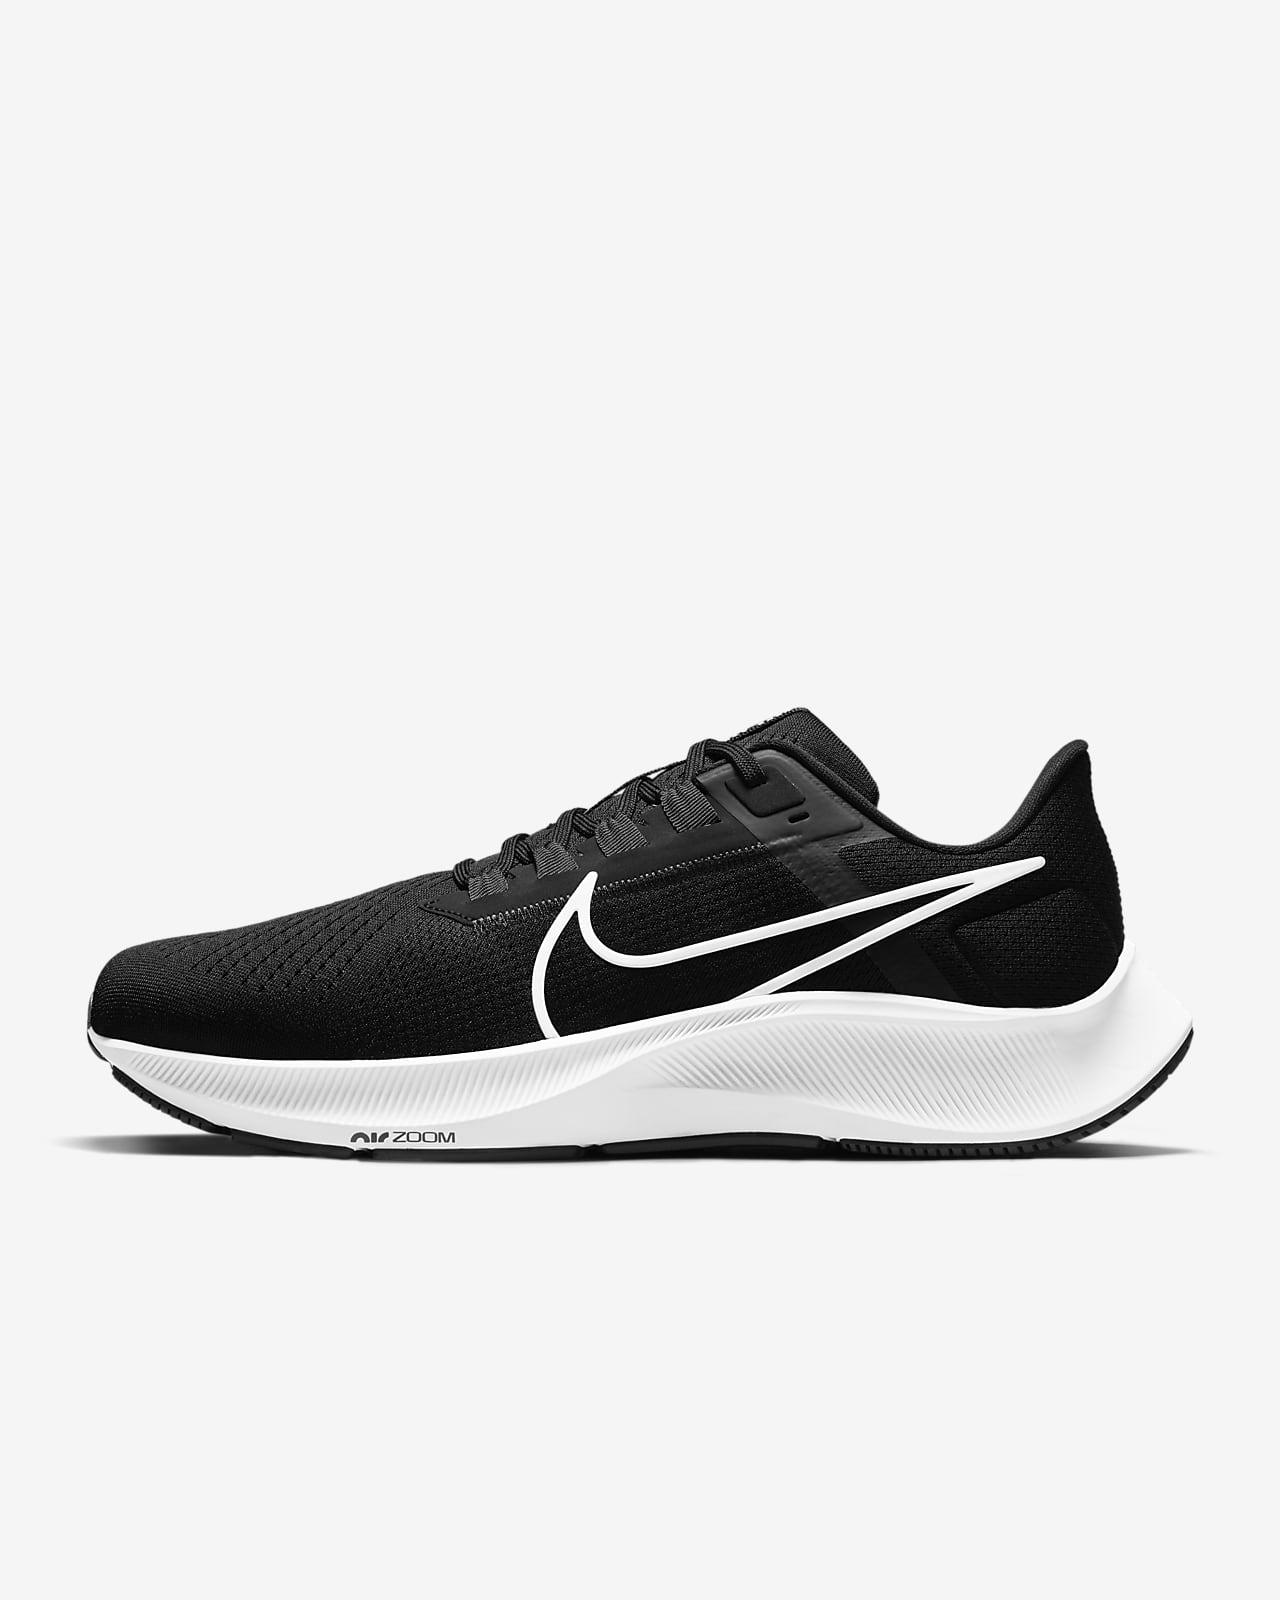 Chaussure de running sur route Nike Air Zoom Pegasus38 pour Homme (extra-large)